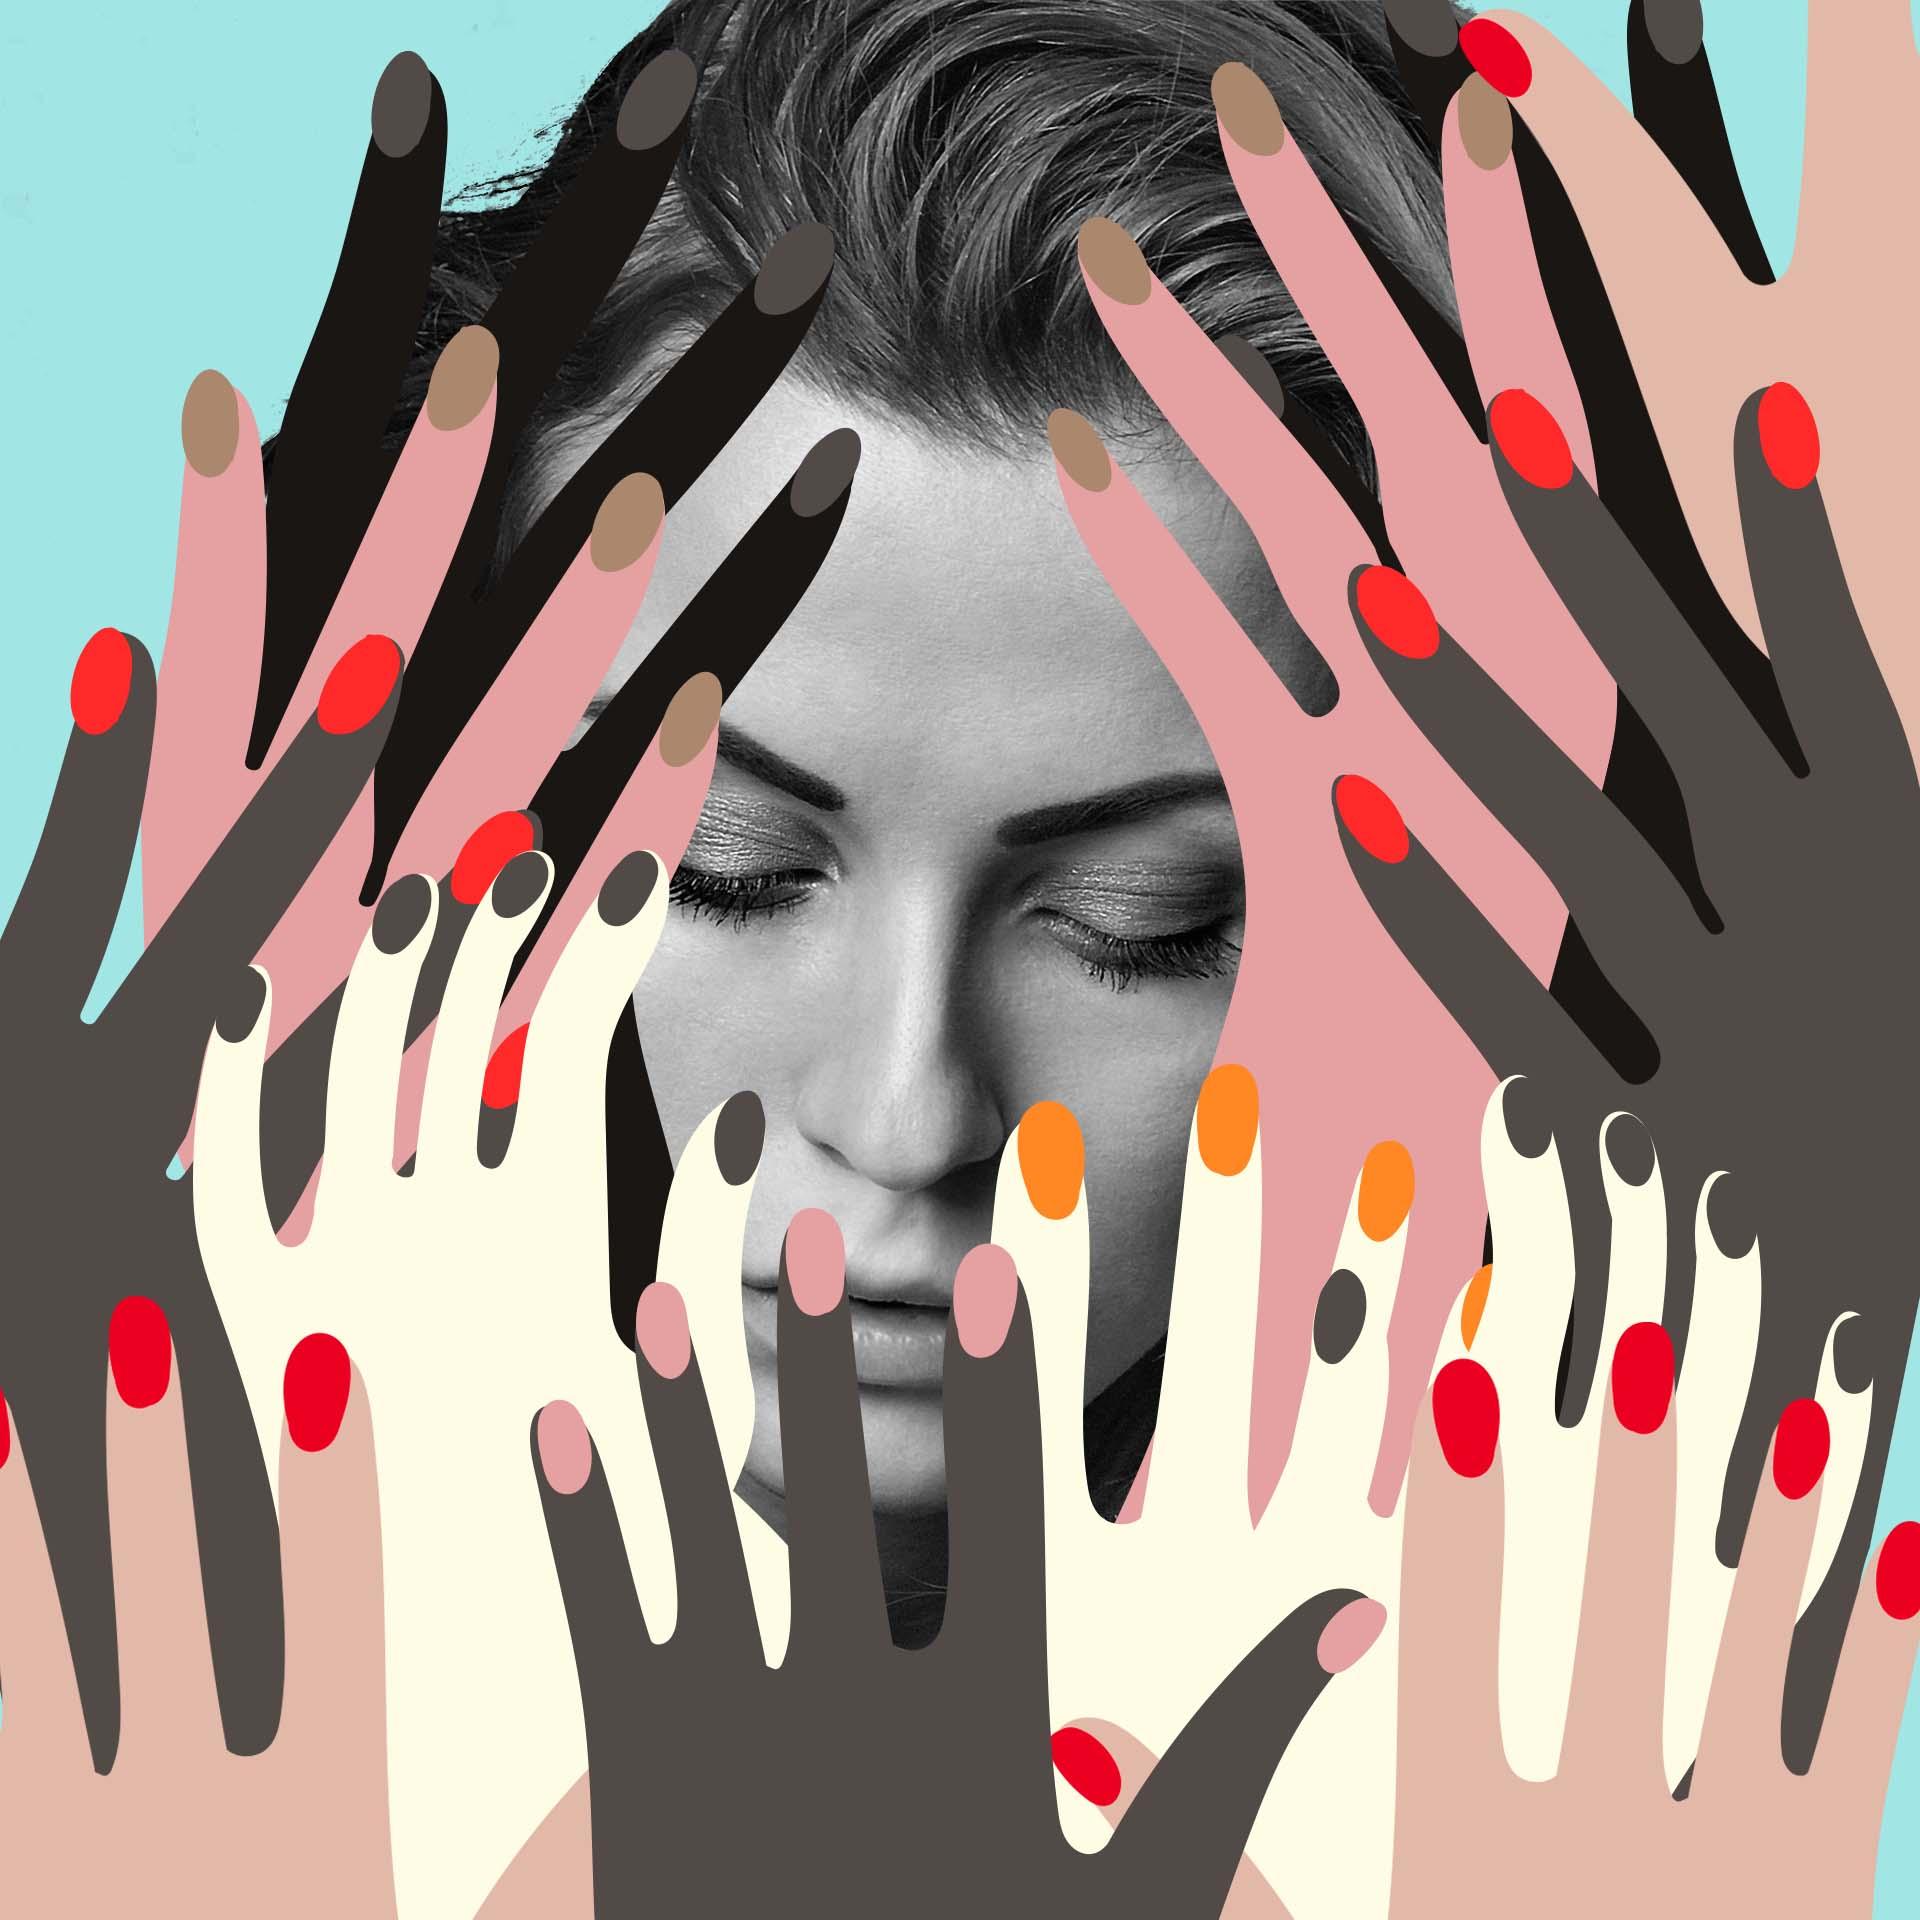 woman face hands black white color fun social media.jpg